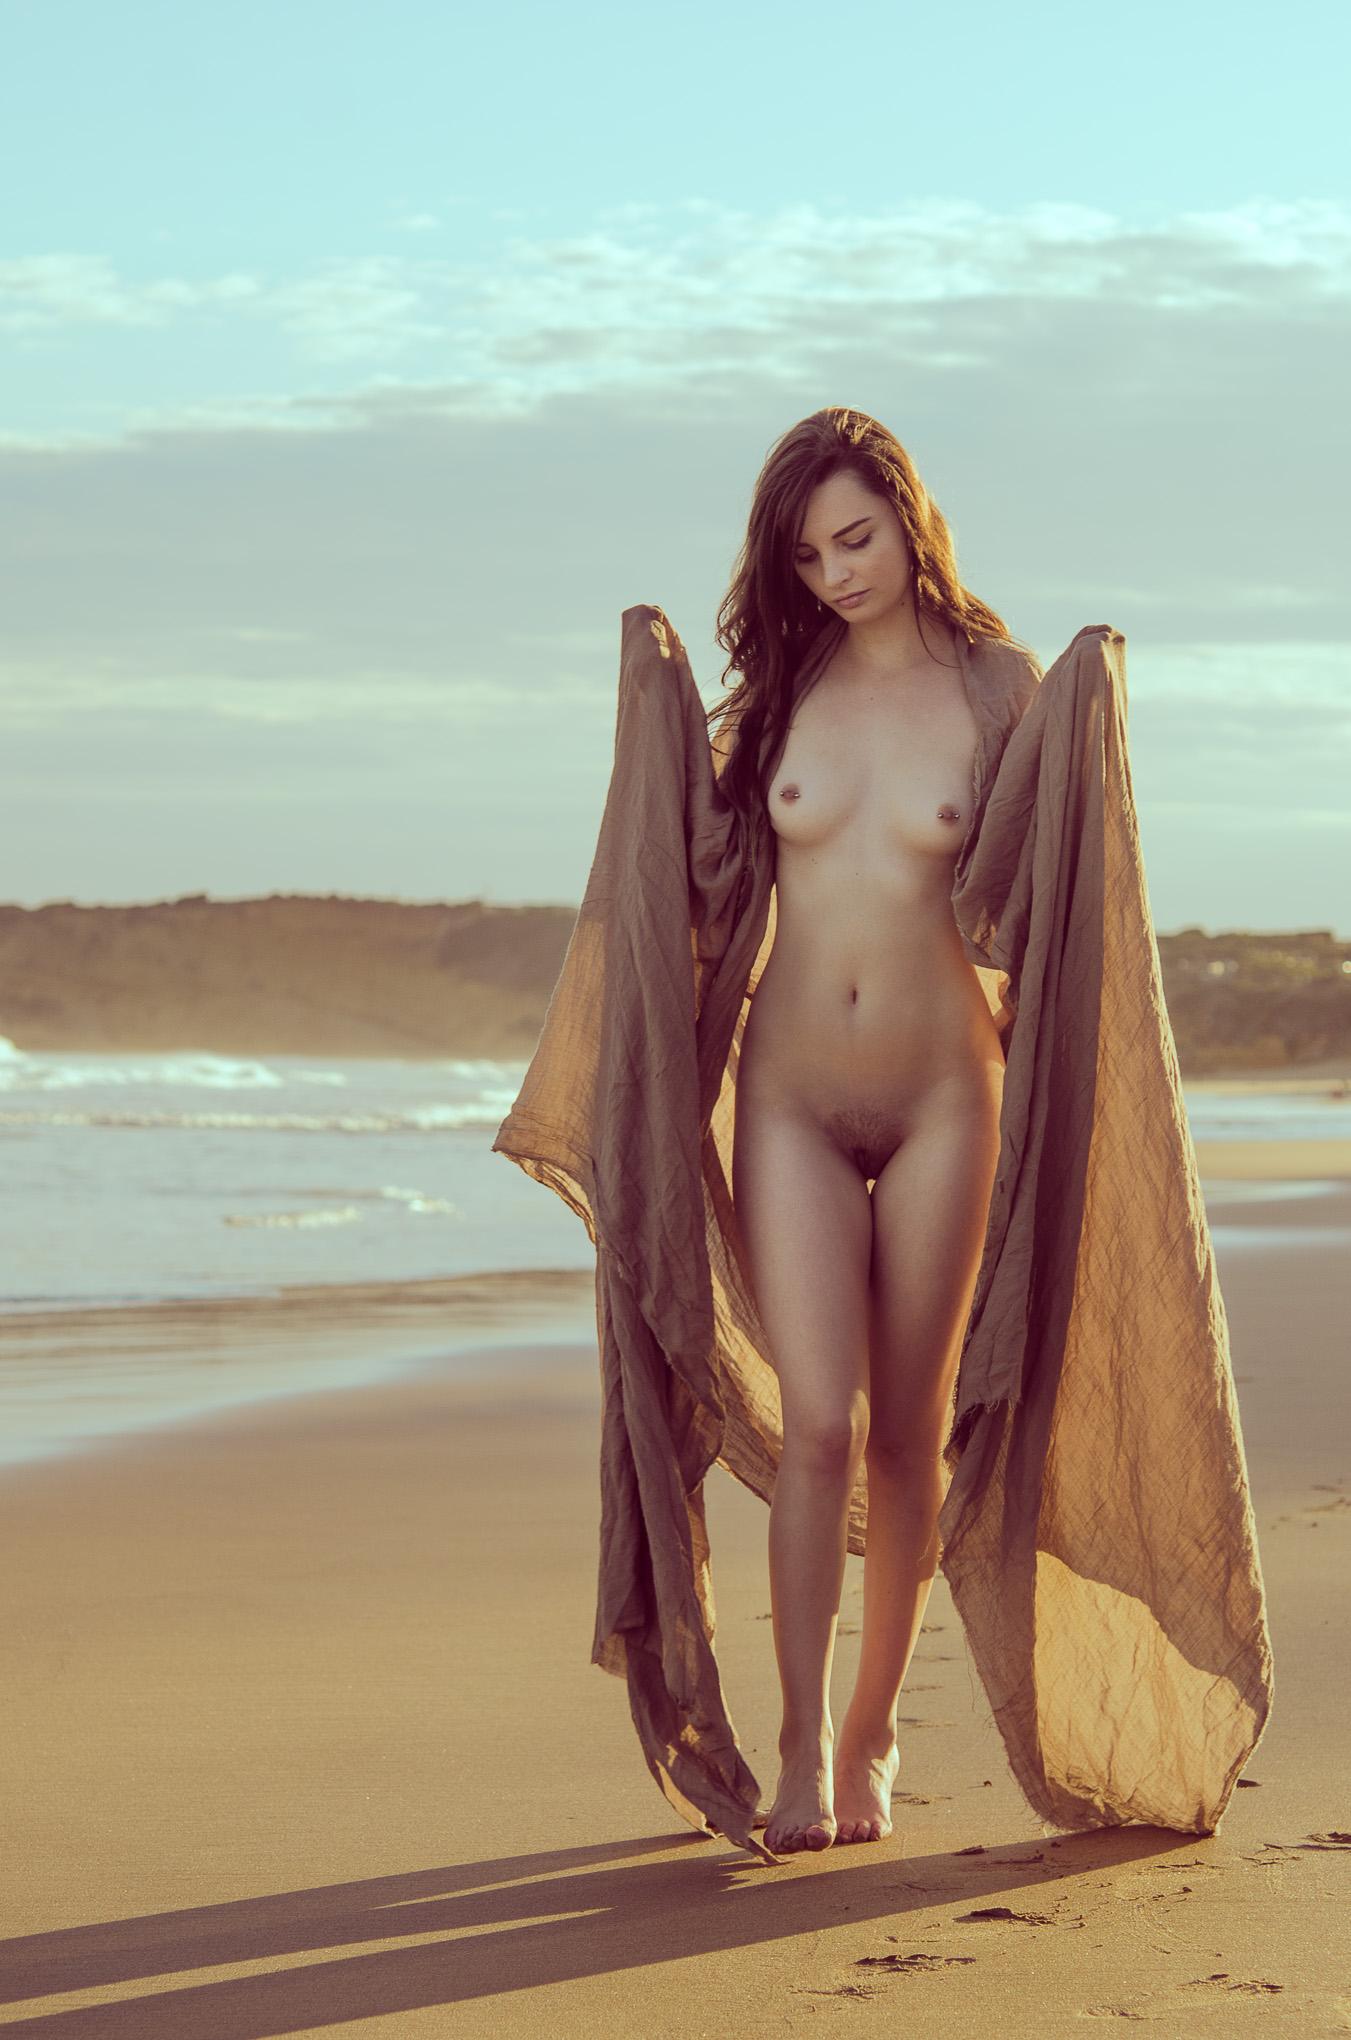 JessicaTorquay-0007795-Edit.jpg